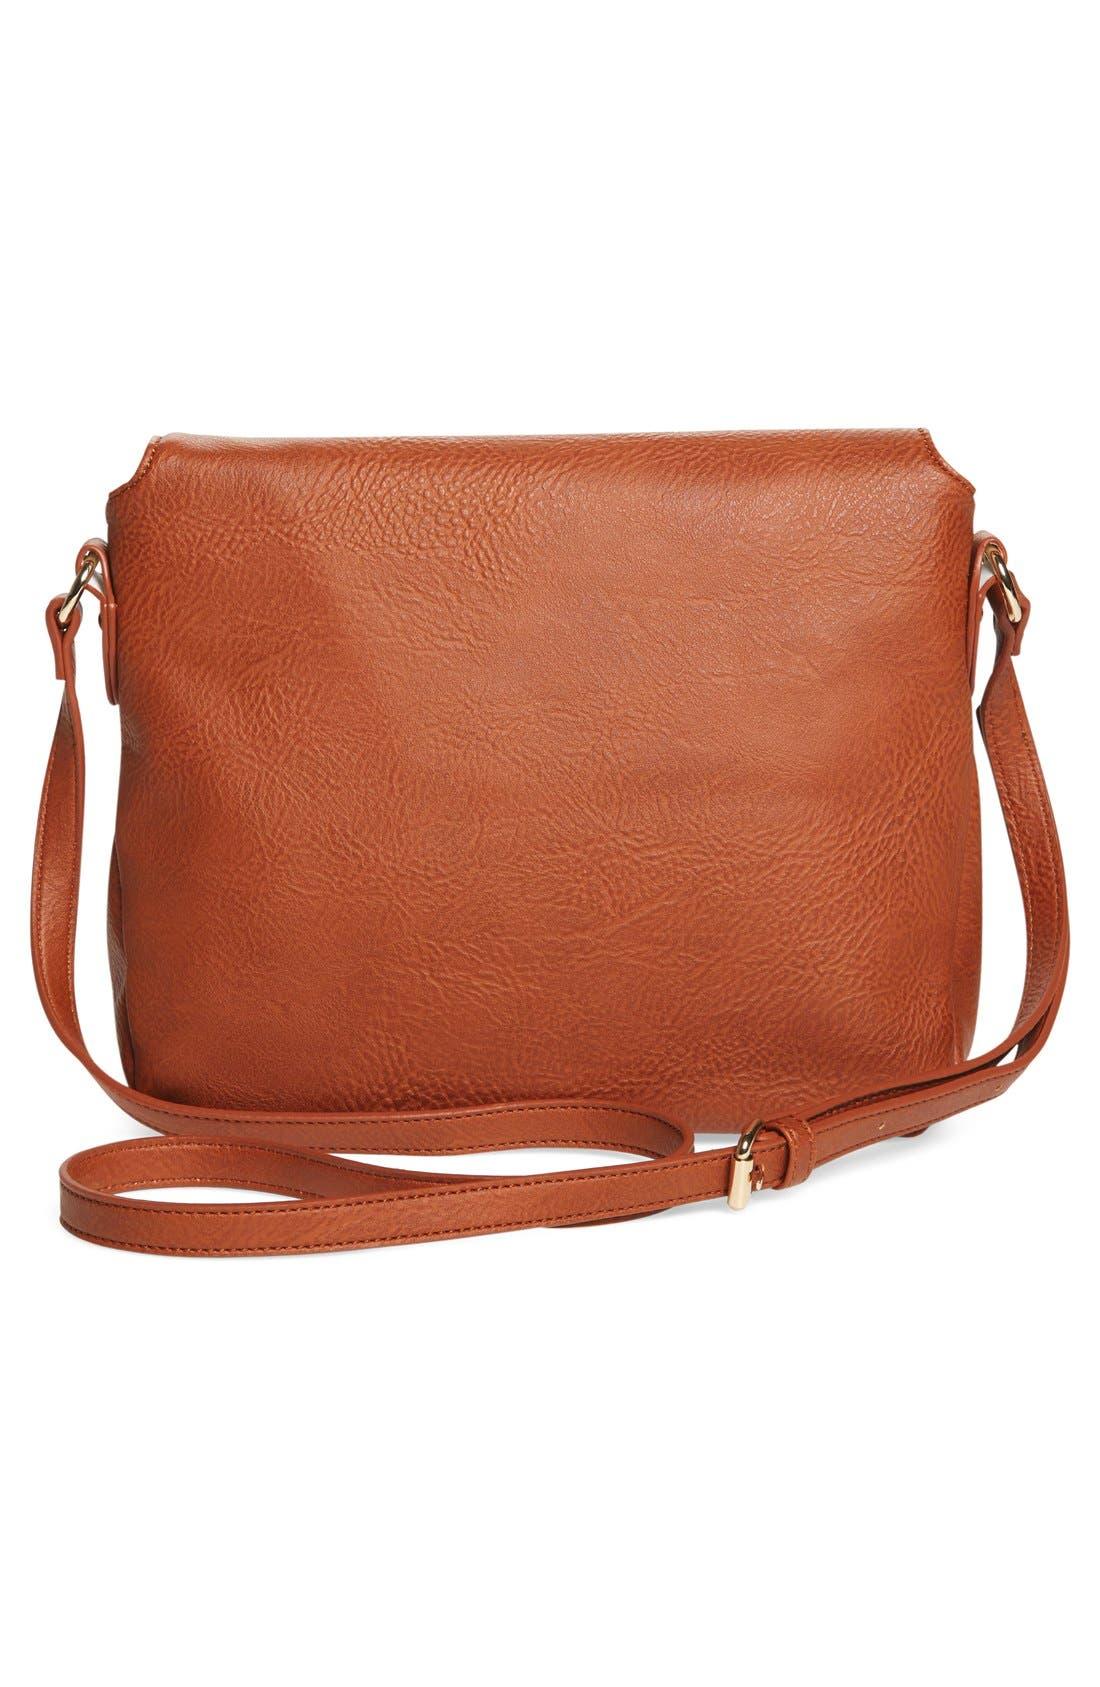 Zip Flap Faux Leather Crossbody Bag,                             Alternate thumbnail 4, color,